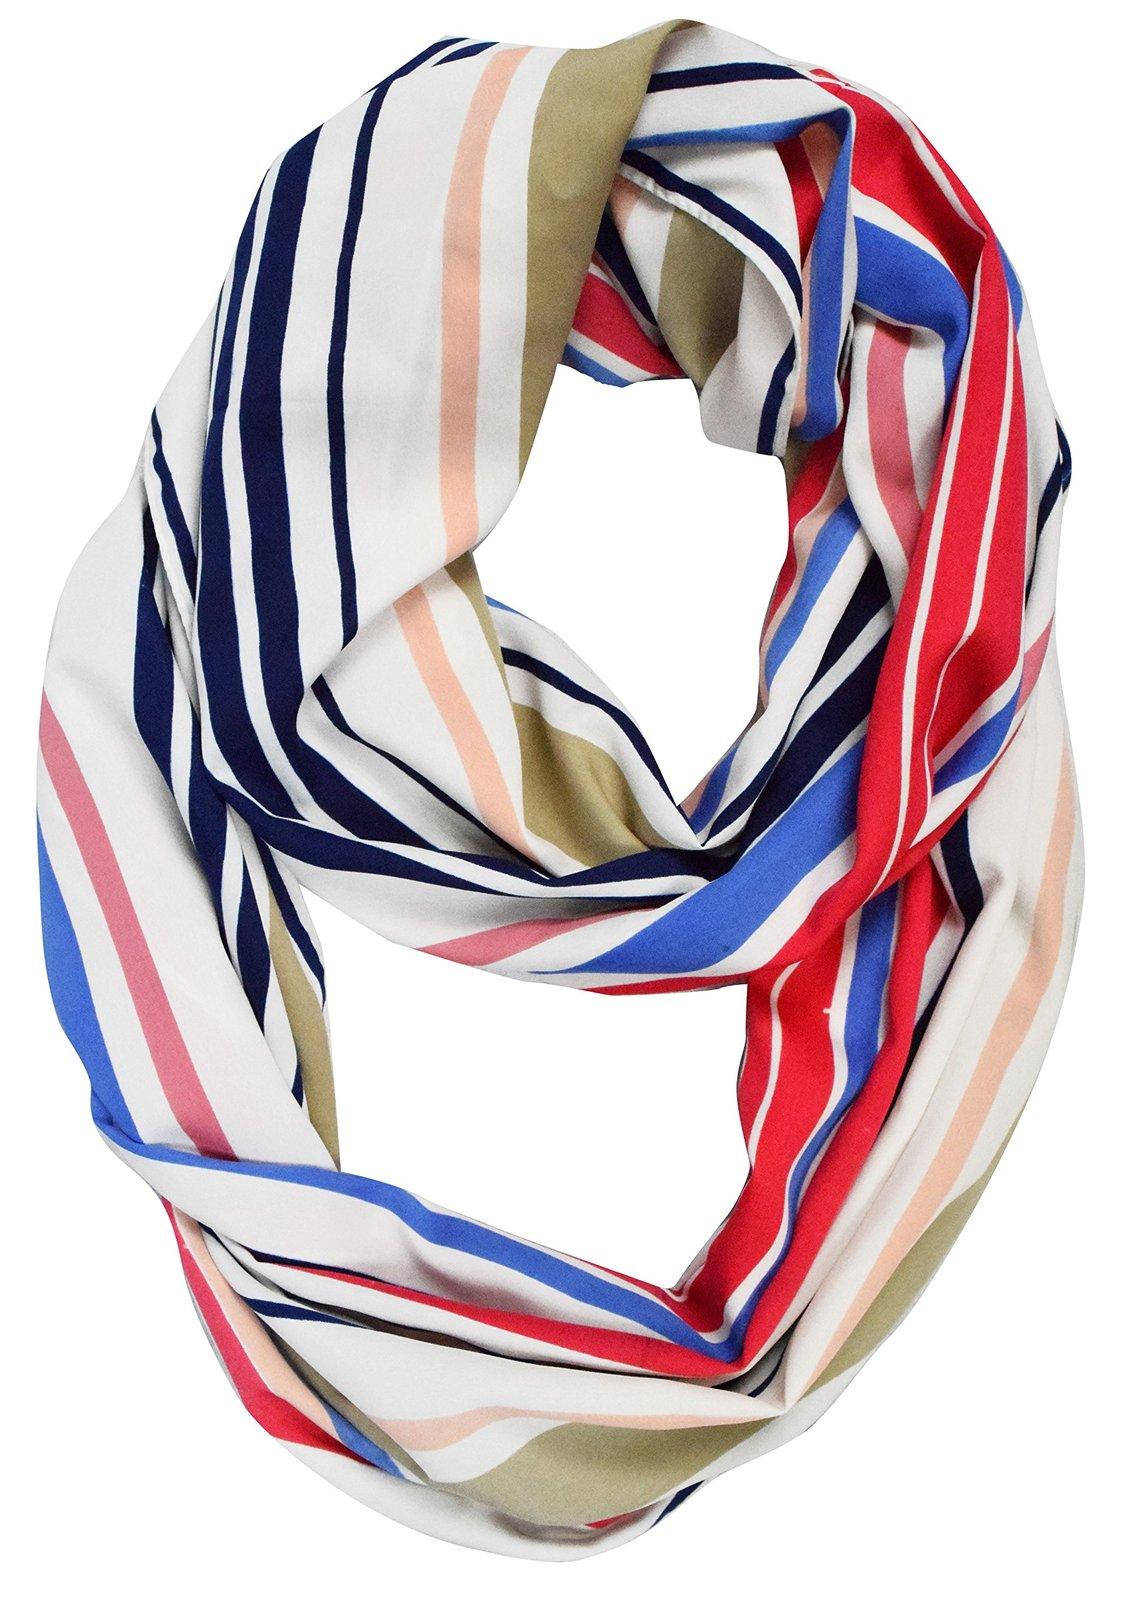 51.99$  Buy now - http://viskw.justgood.pw/vig/item.php?t=dzo81tz12943 - Craze Chunky Cable Knit Scarf SVKPB 51.99$